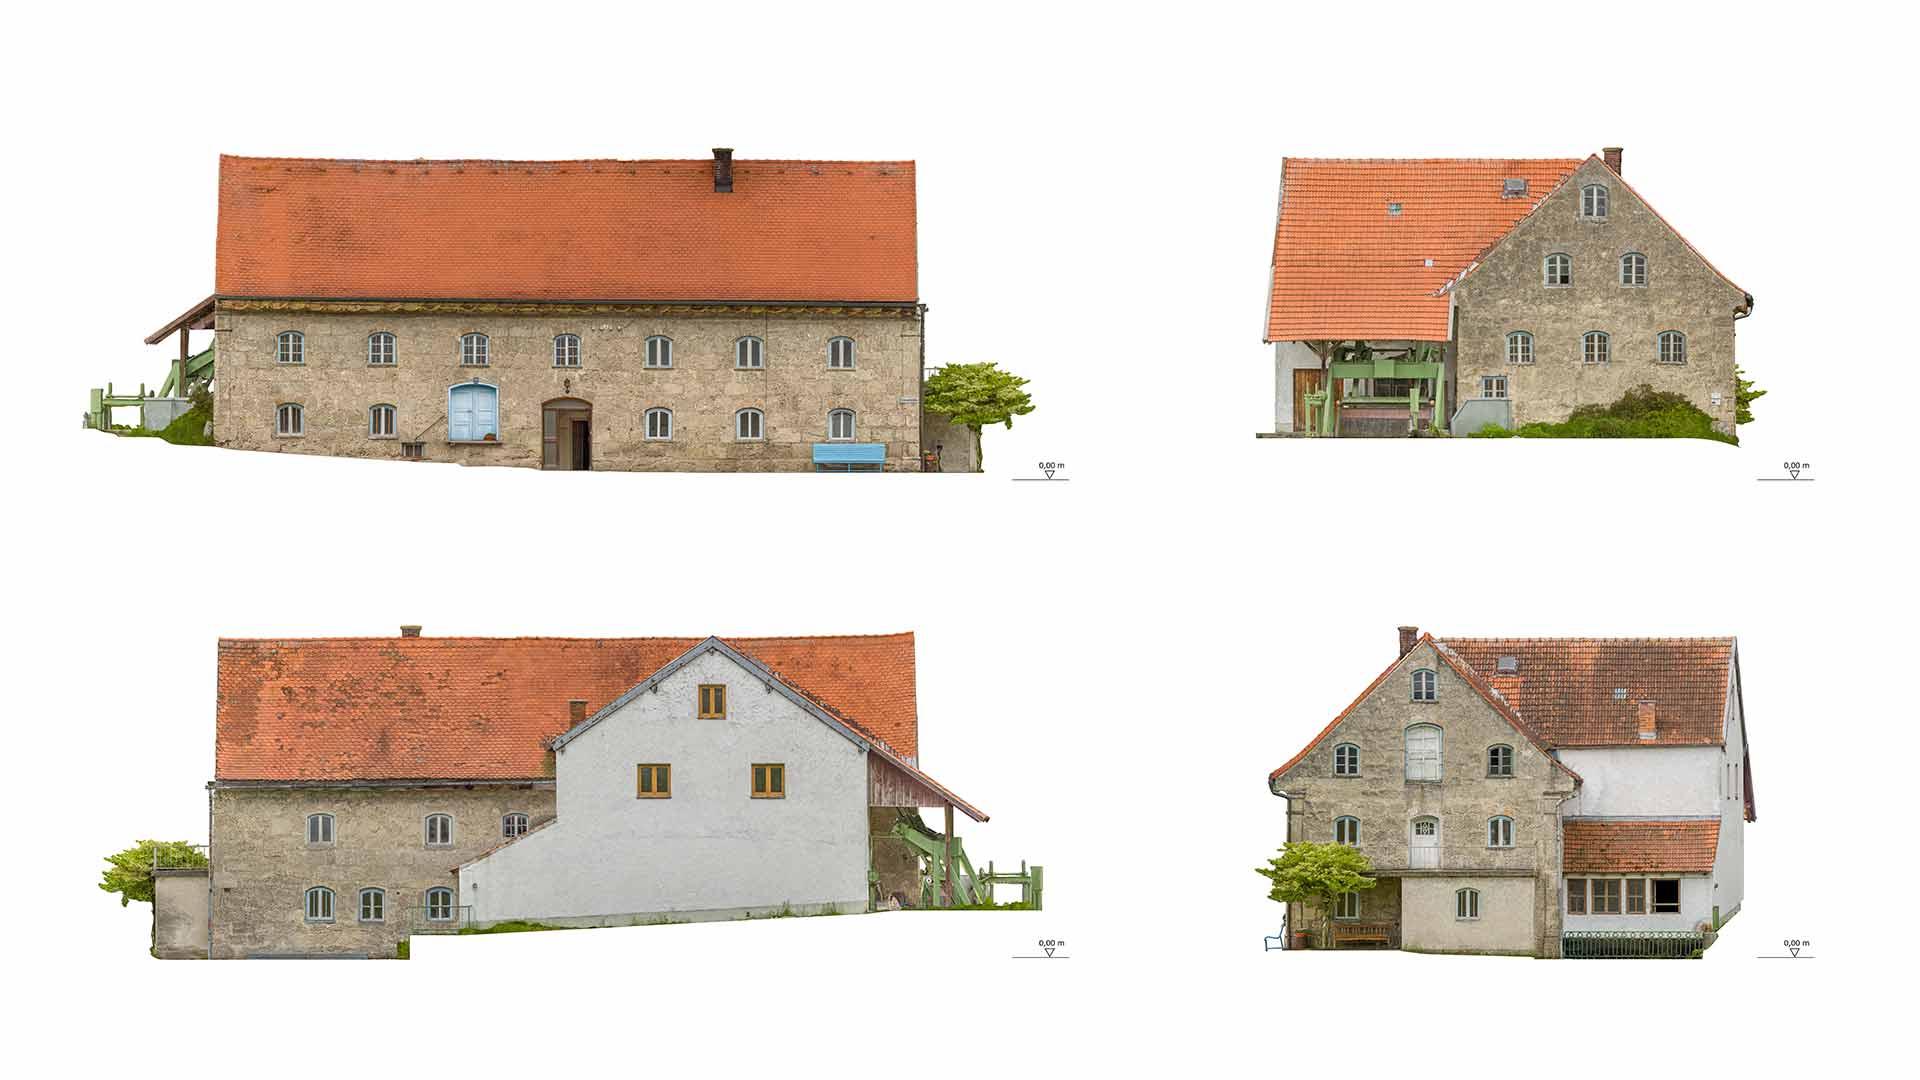 Rehdorf Gassenmühle Orthofotos